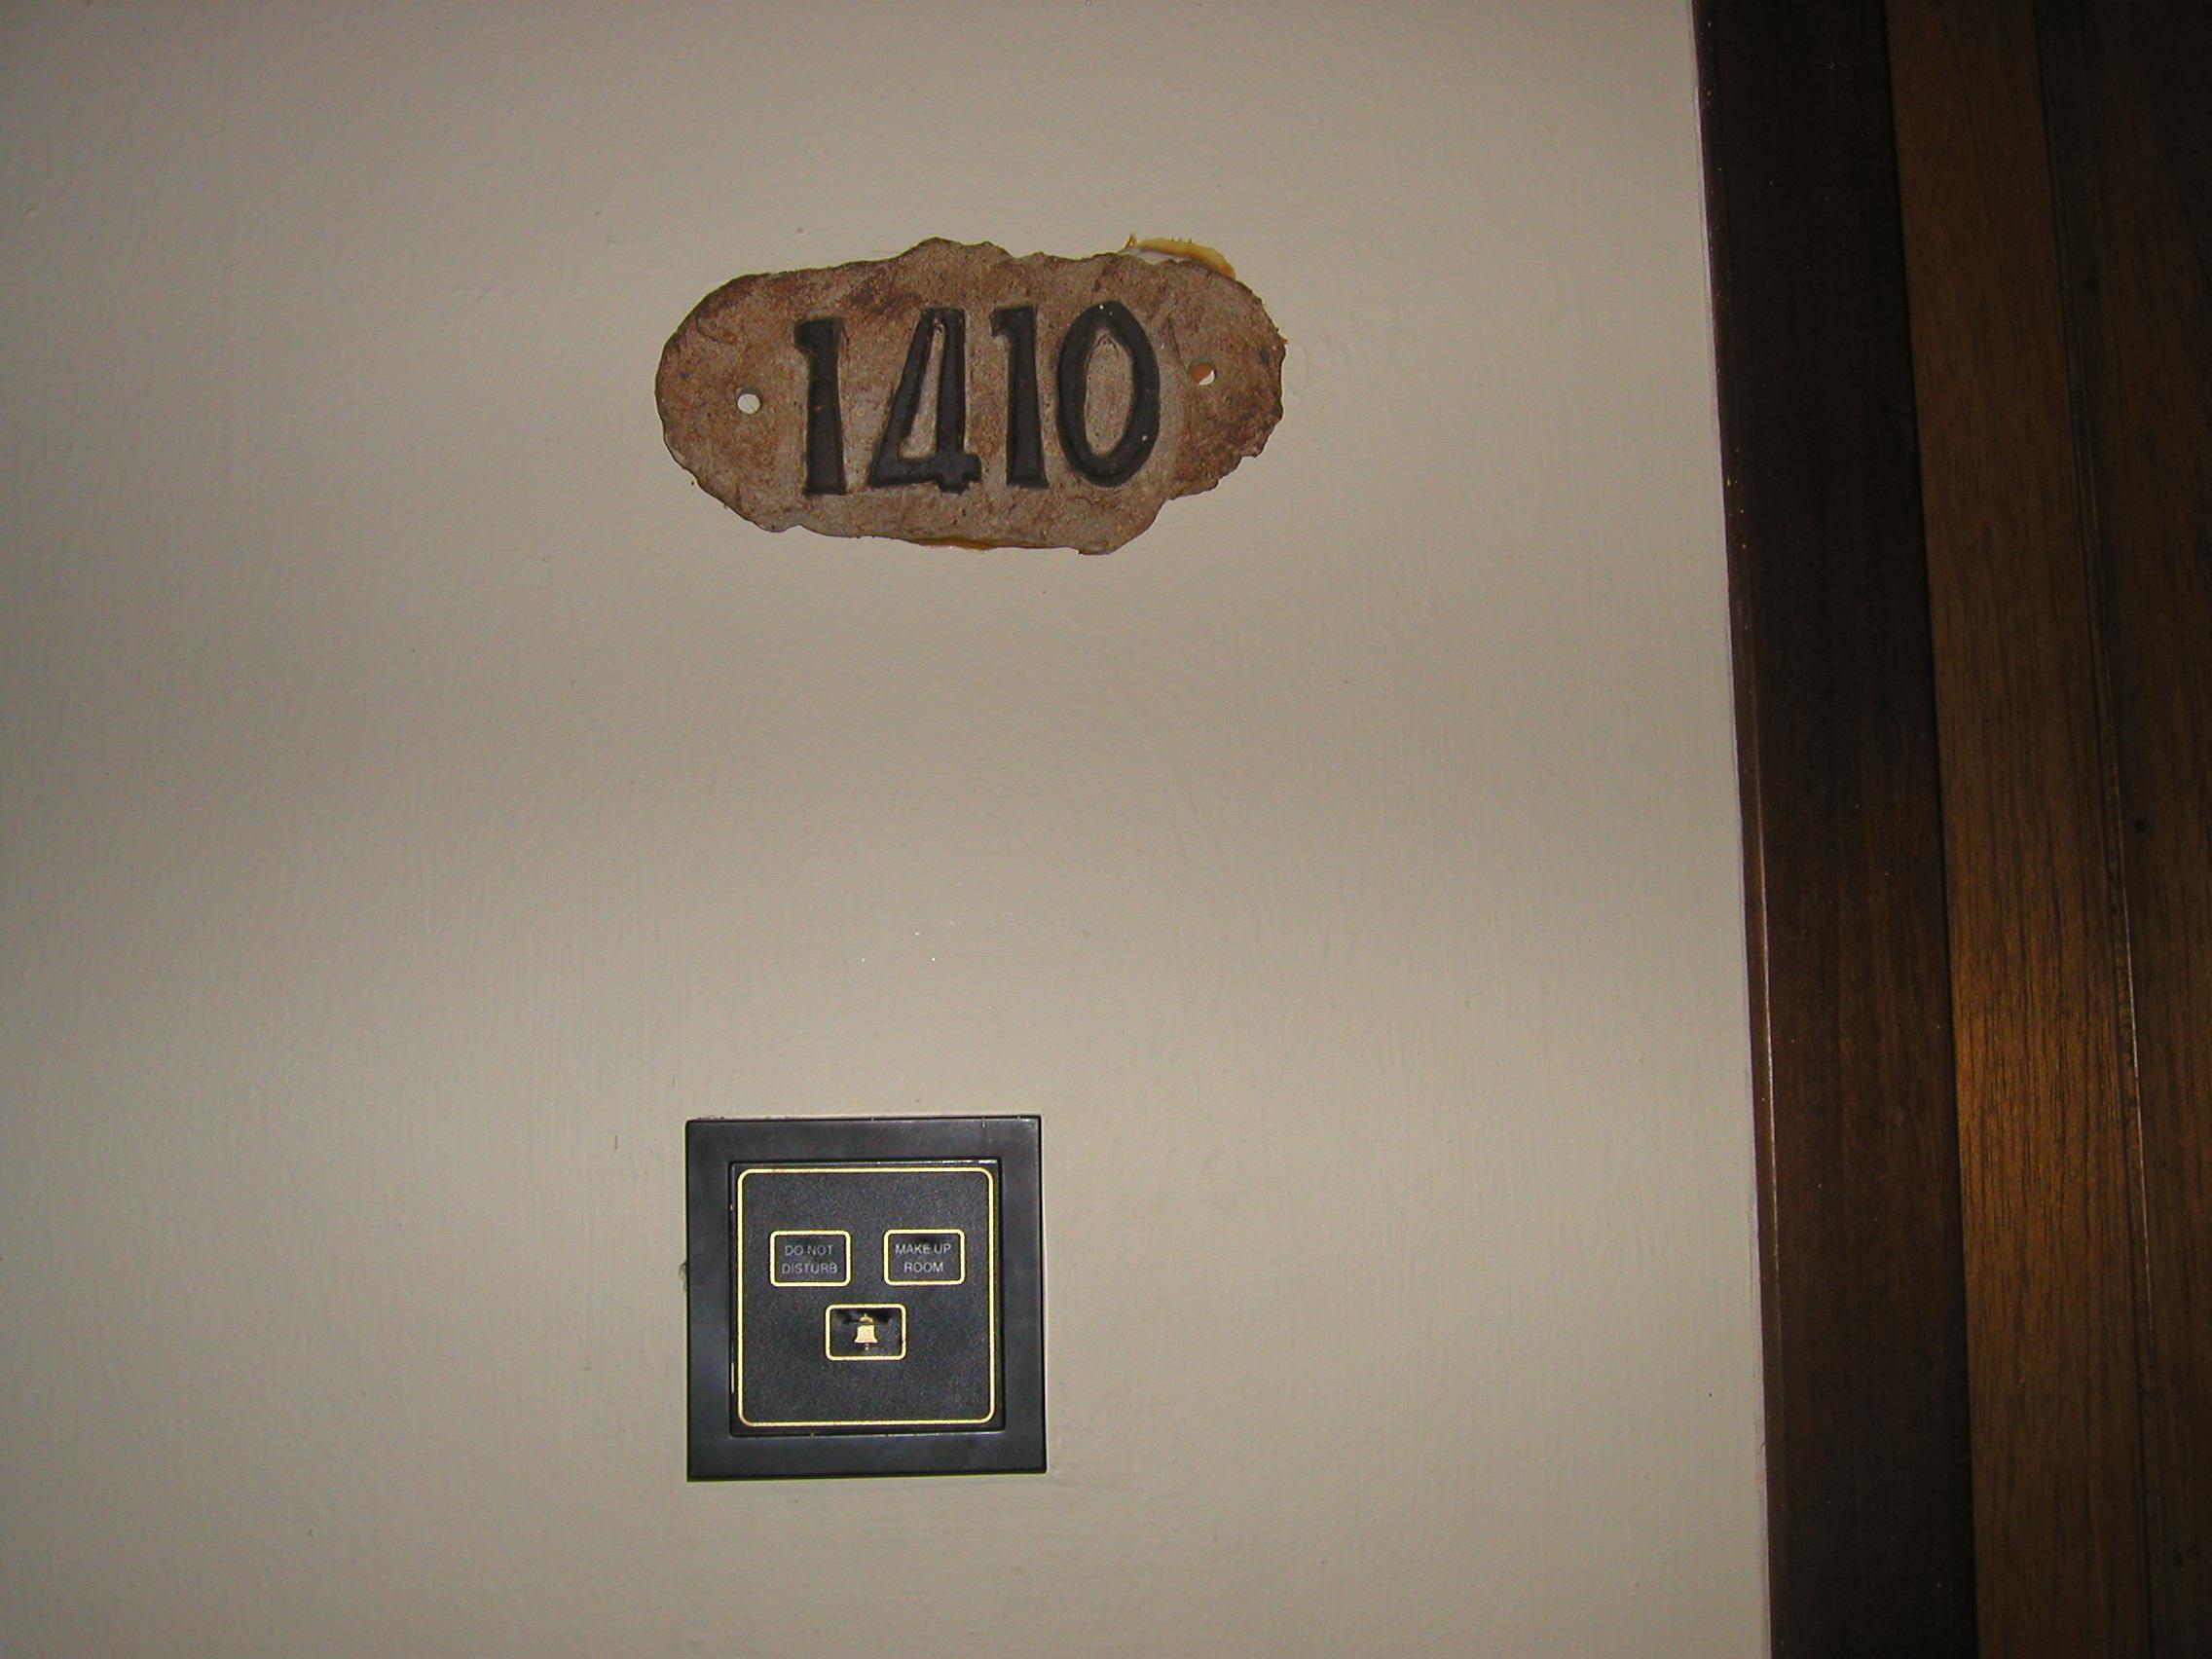 №1410